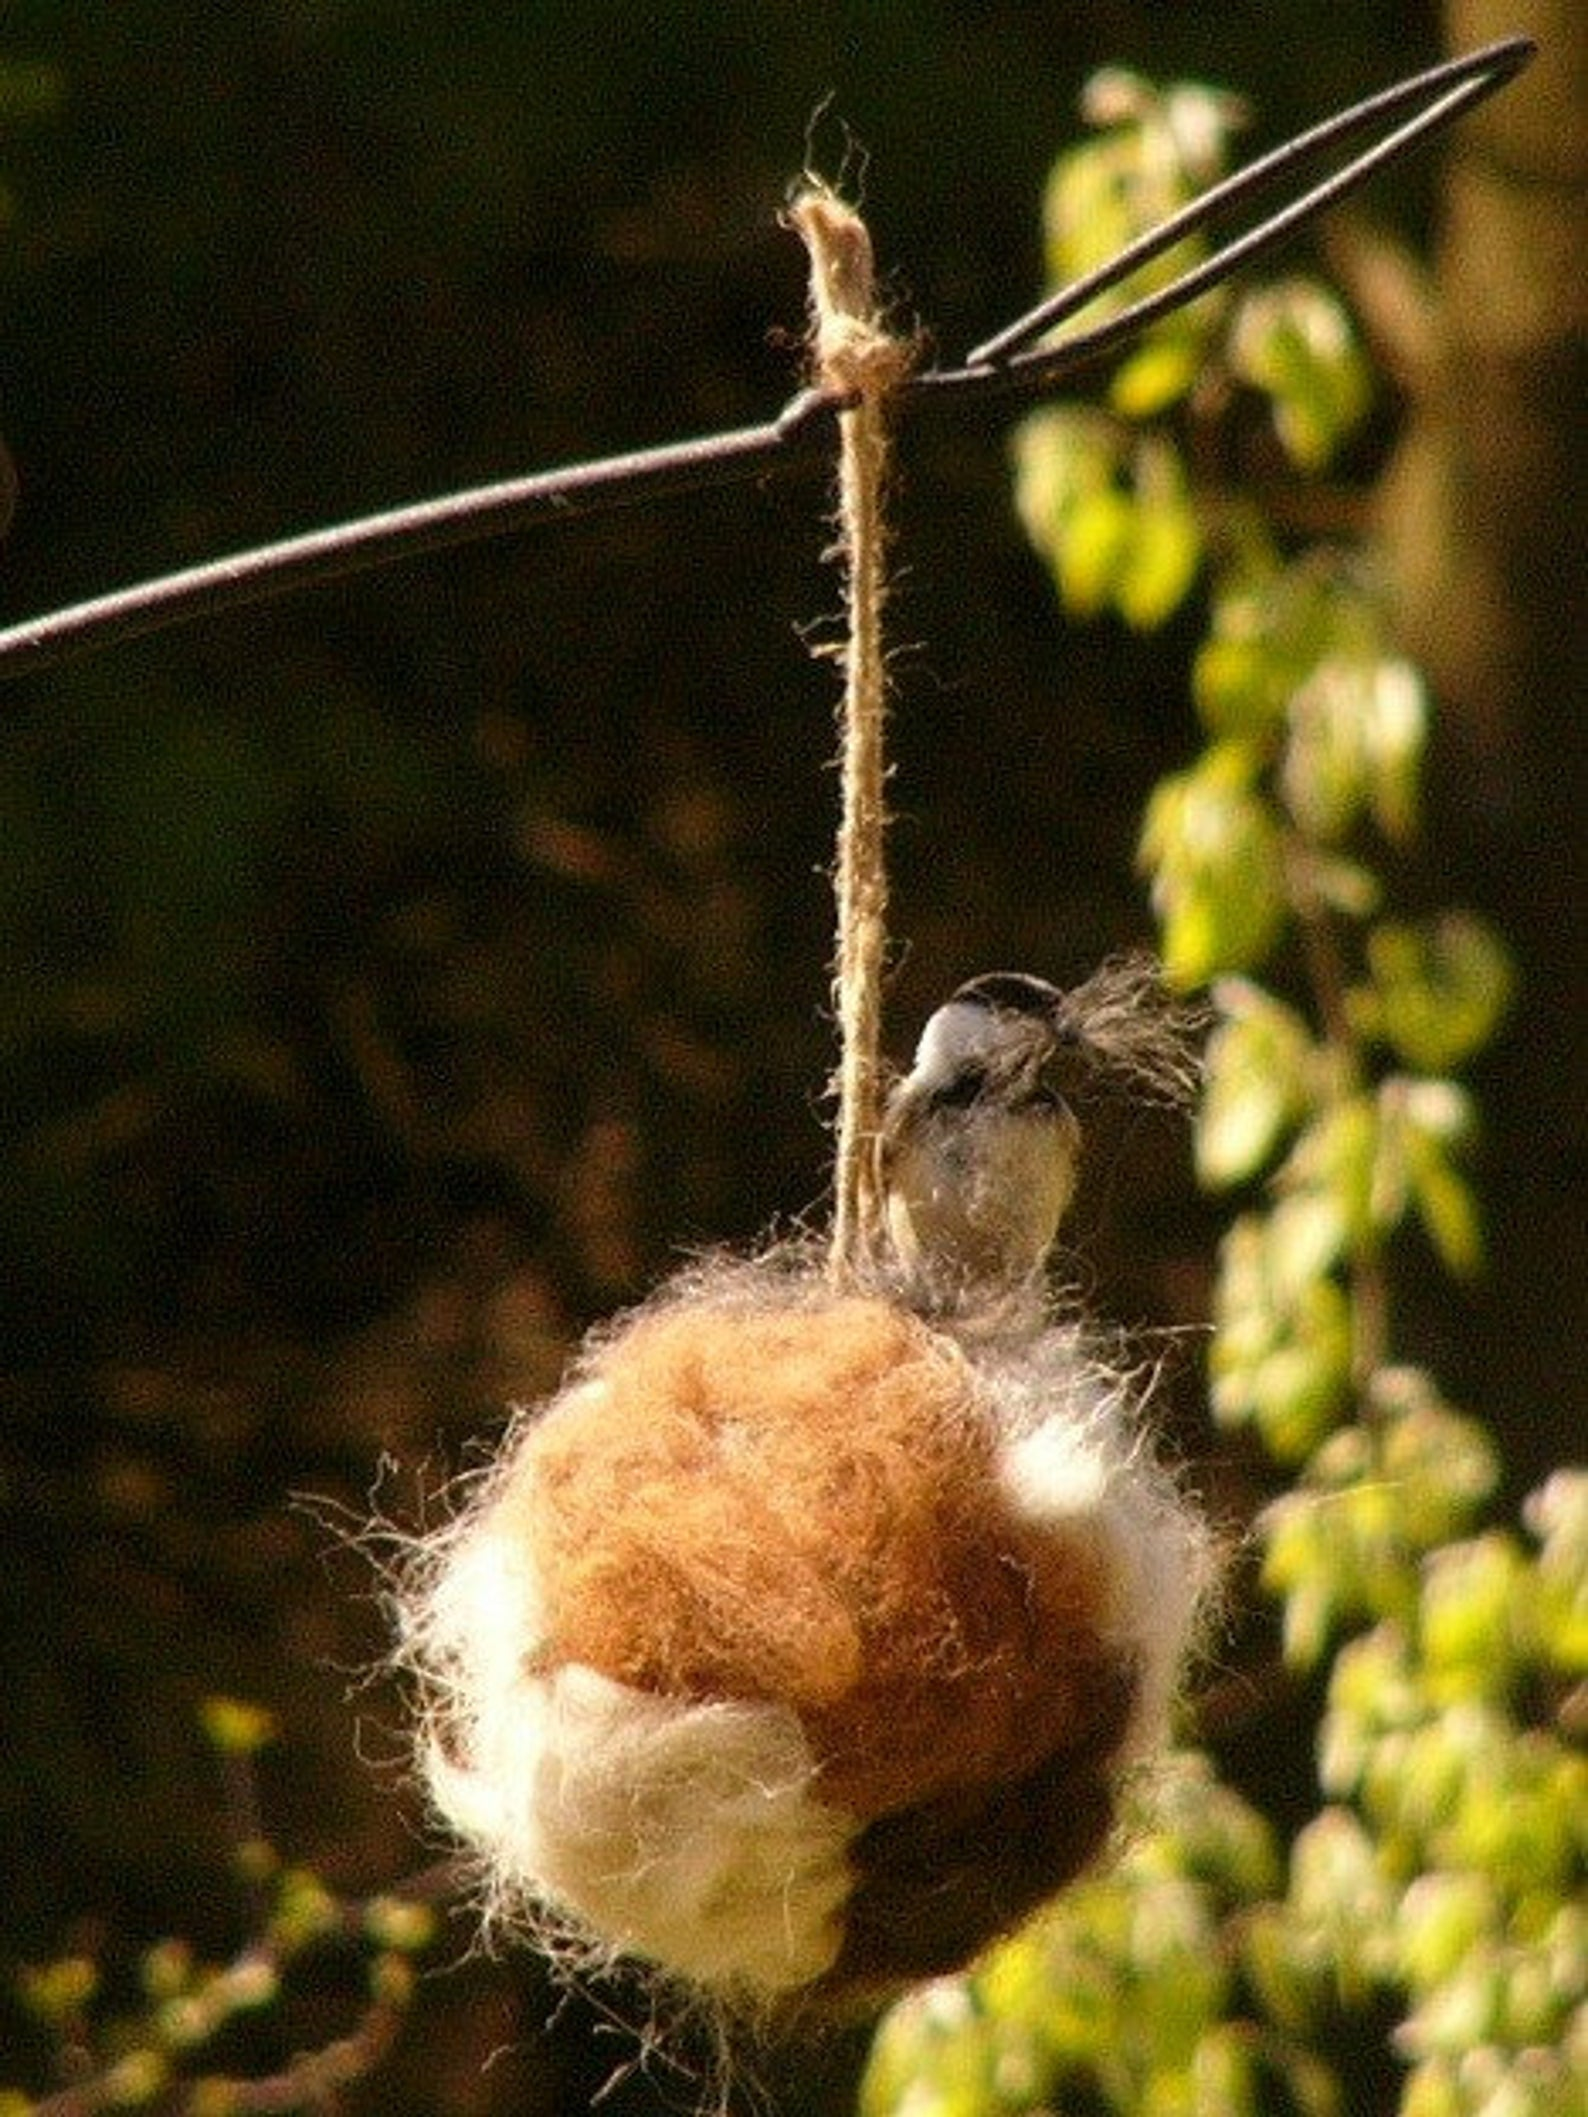 Alpaca Bird Nesting Ball by Gifter World